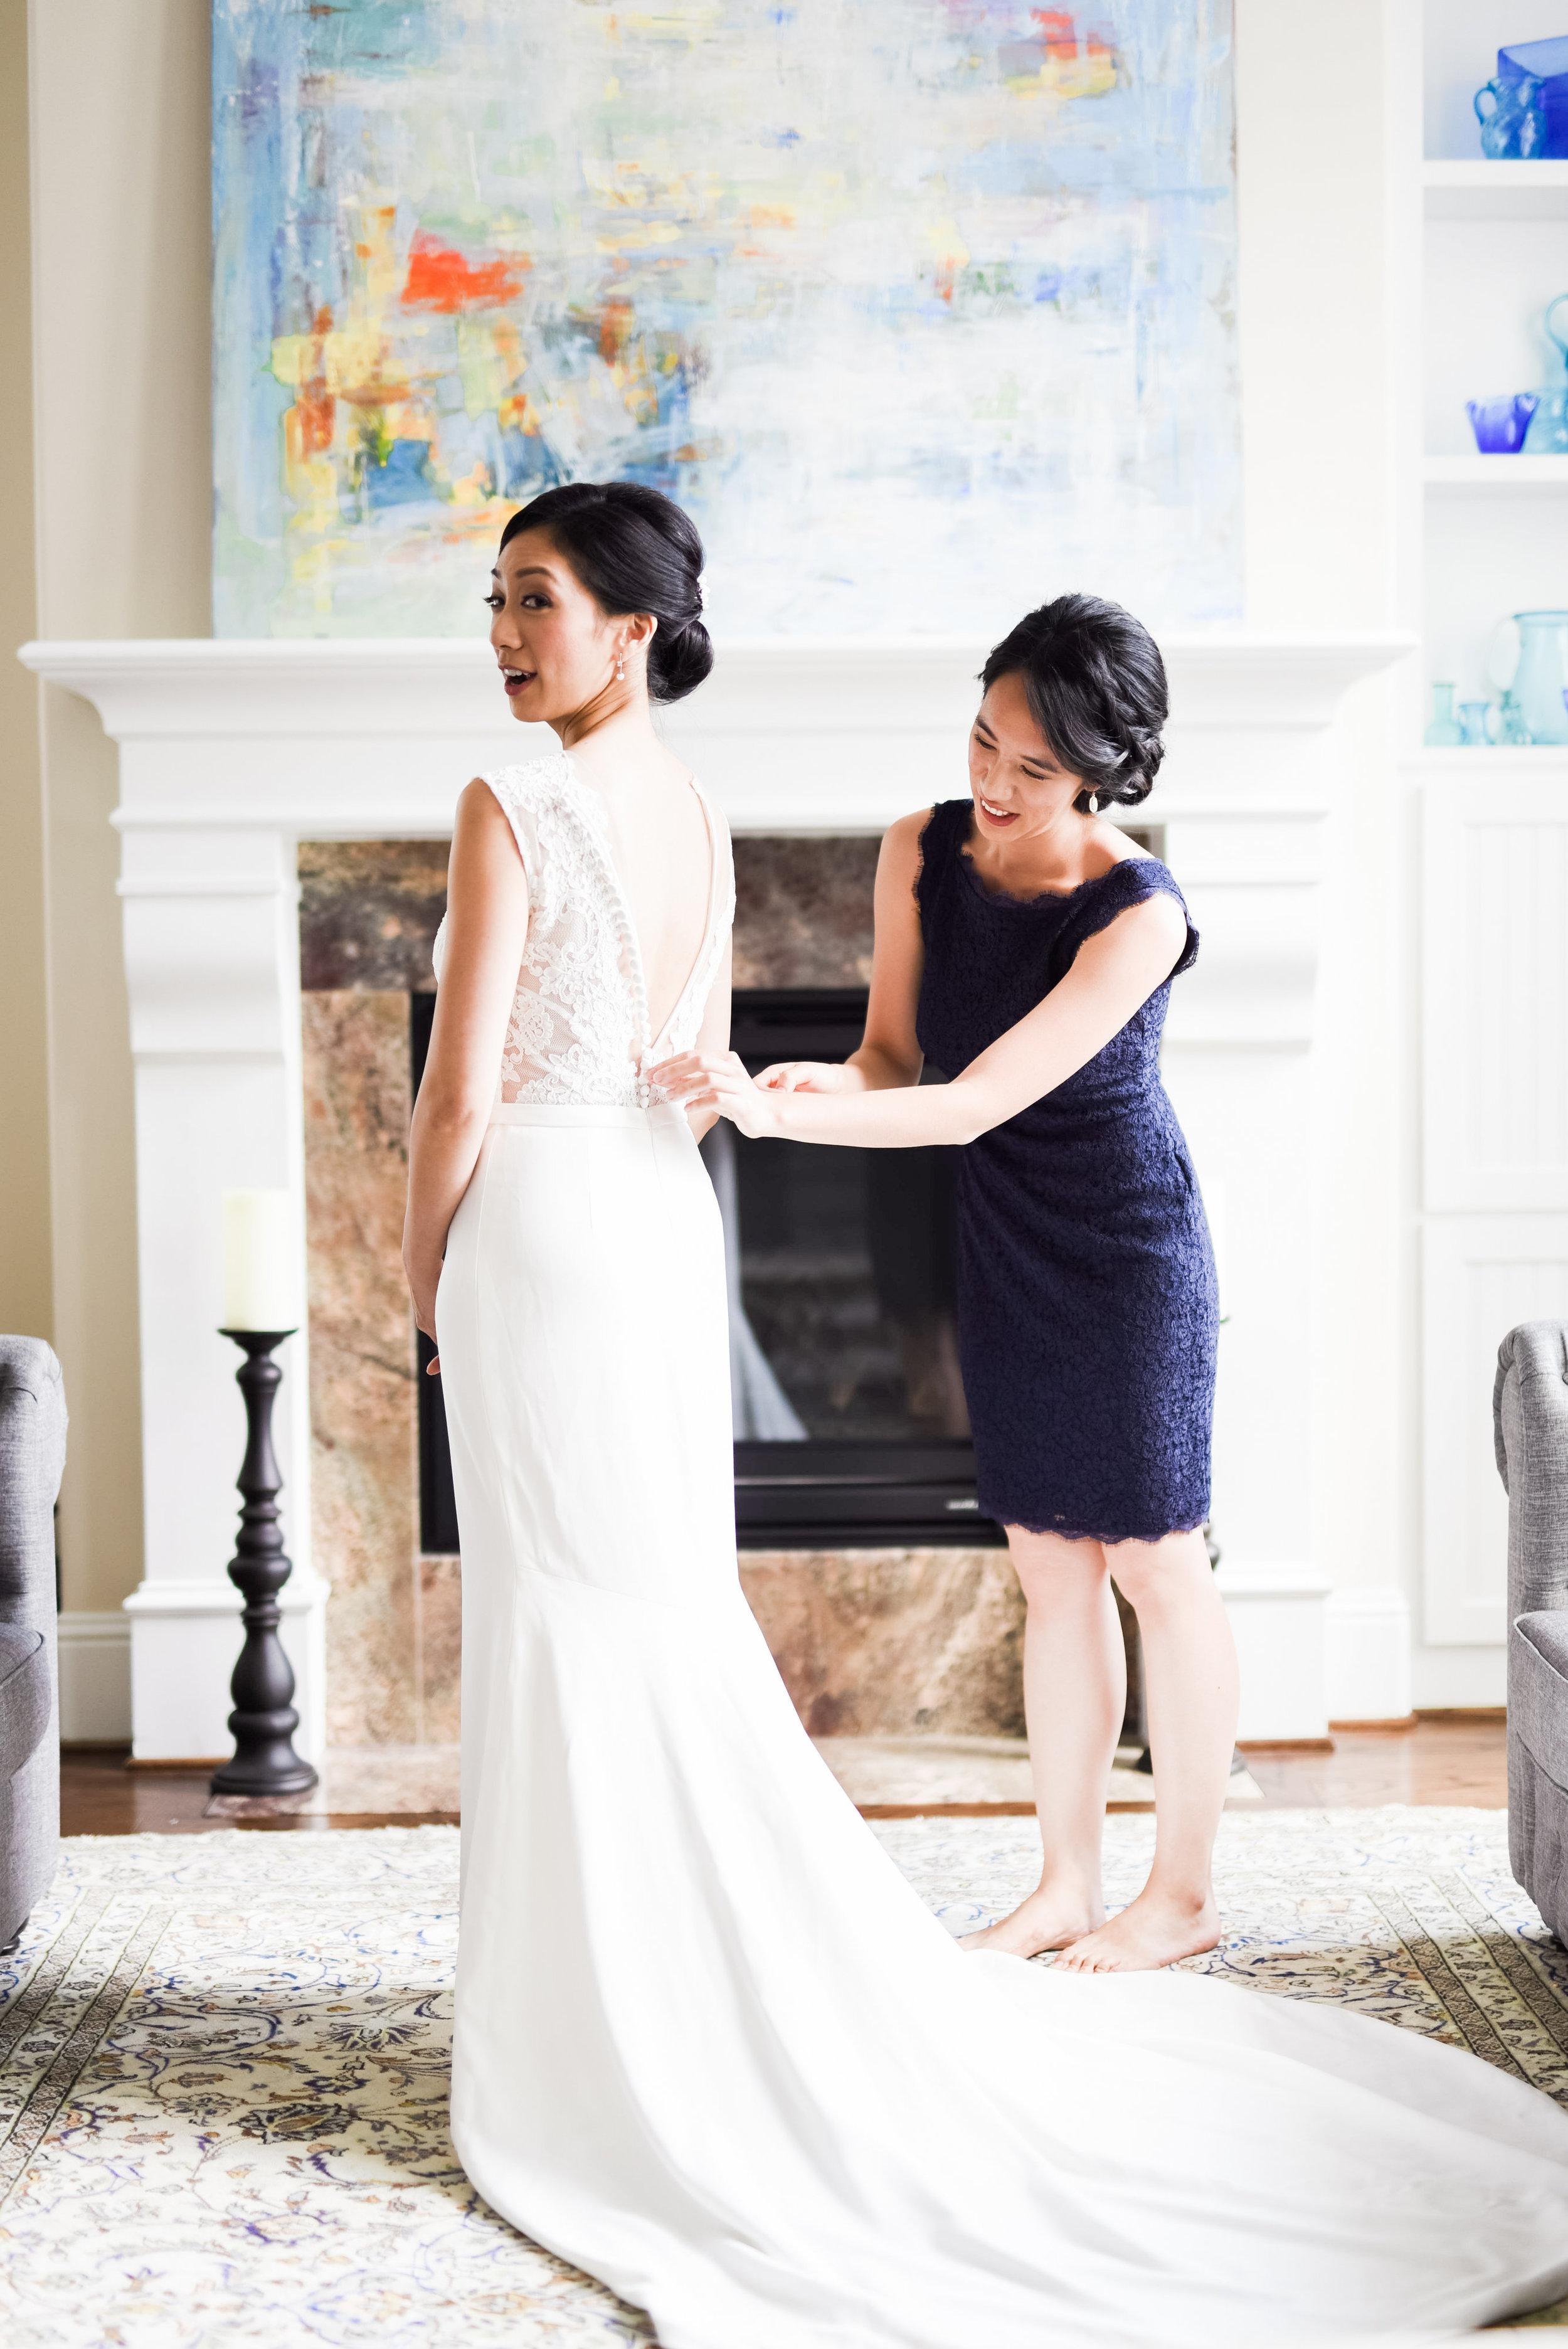 Cathleen-Jeha-Wedding-Pharris-Photography06.jpg